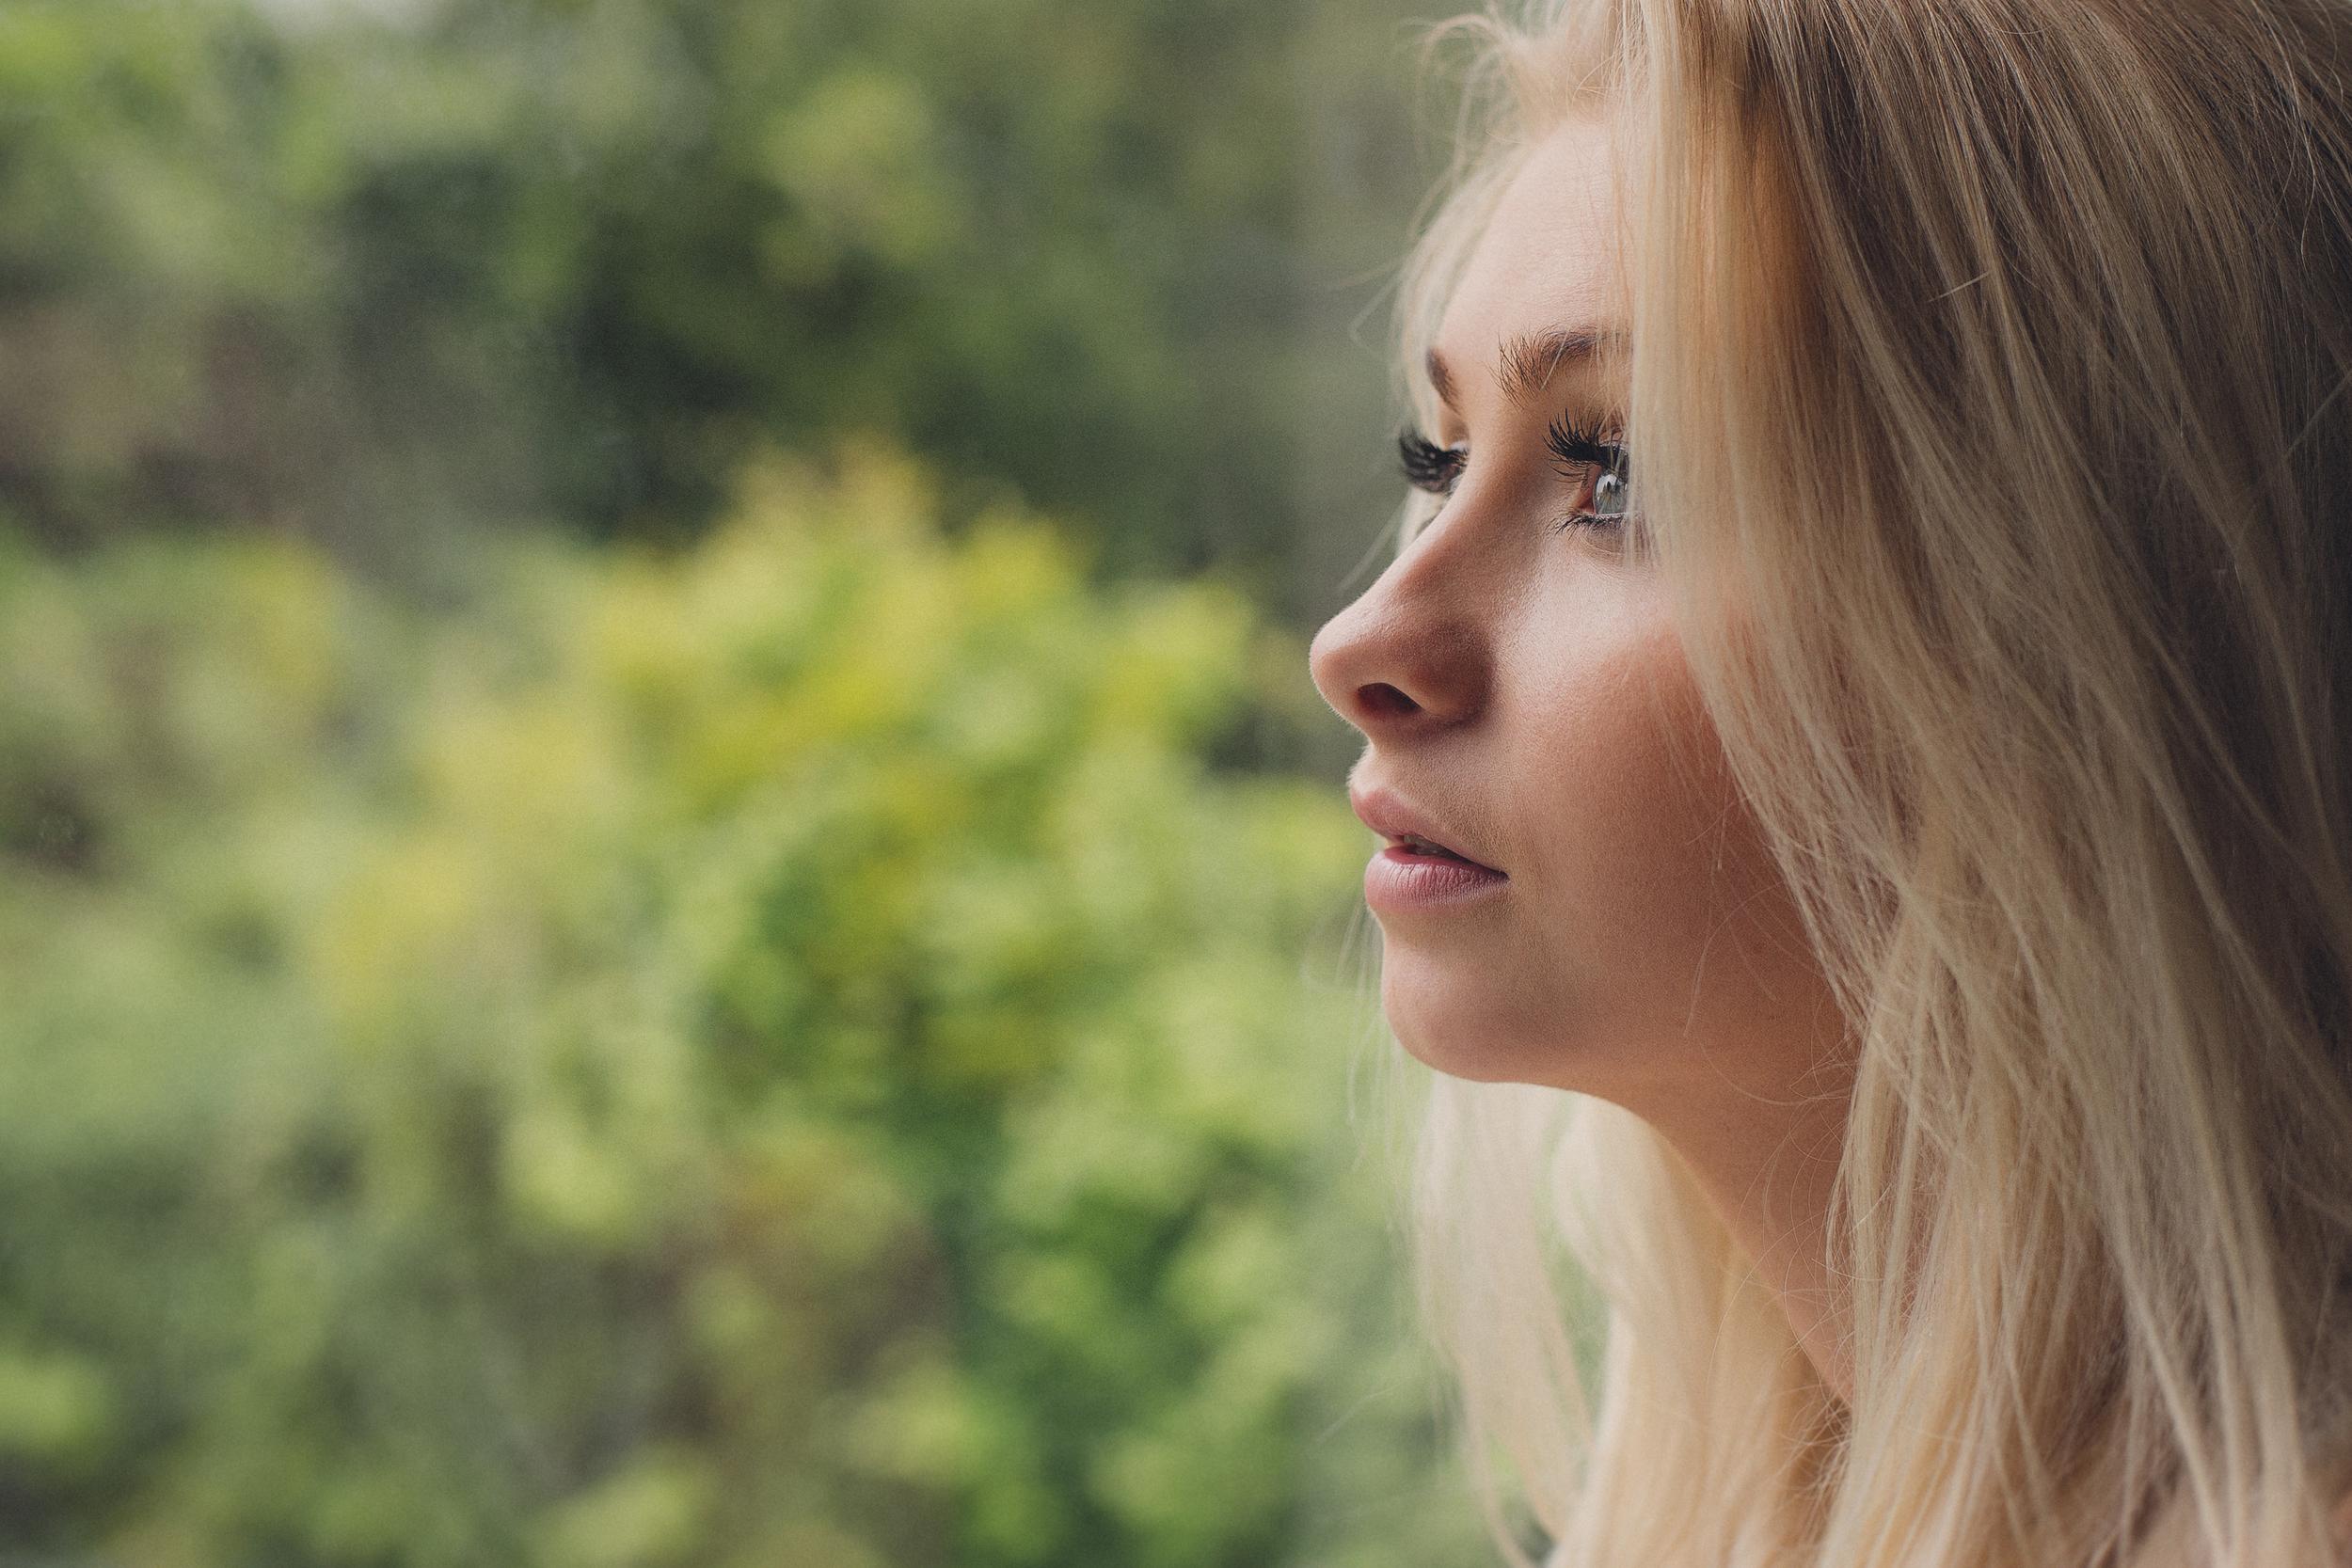 Nicole hinson window portrait